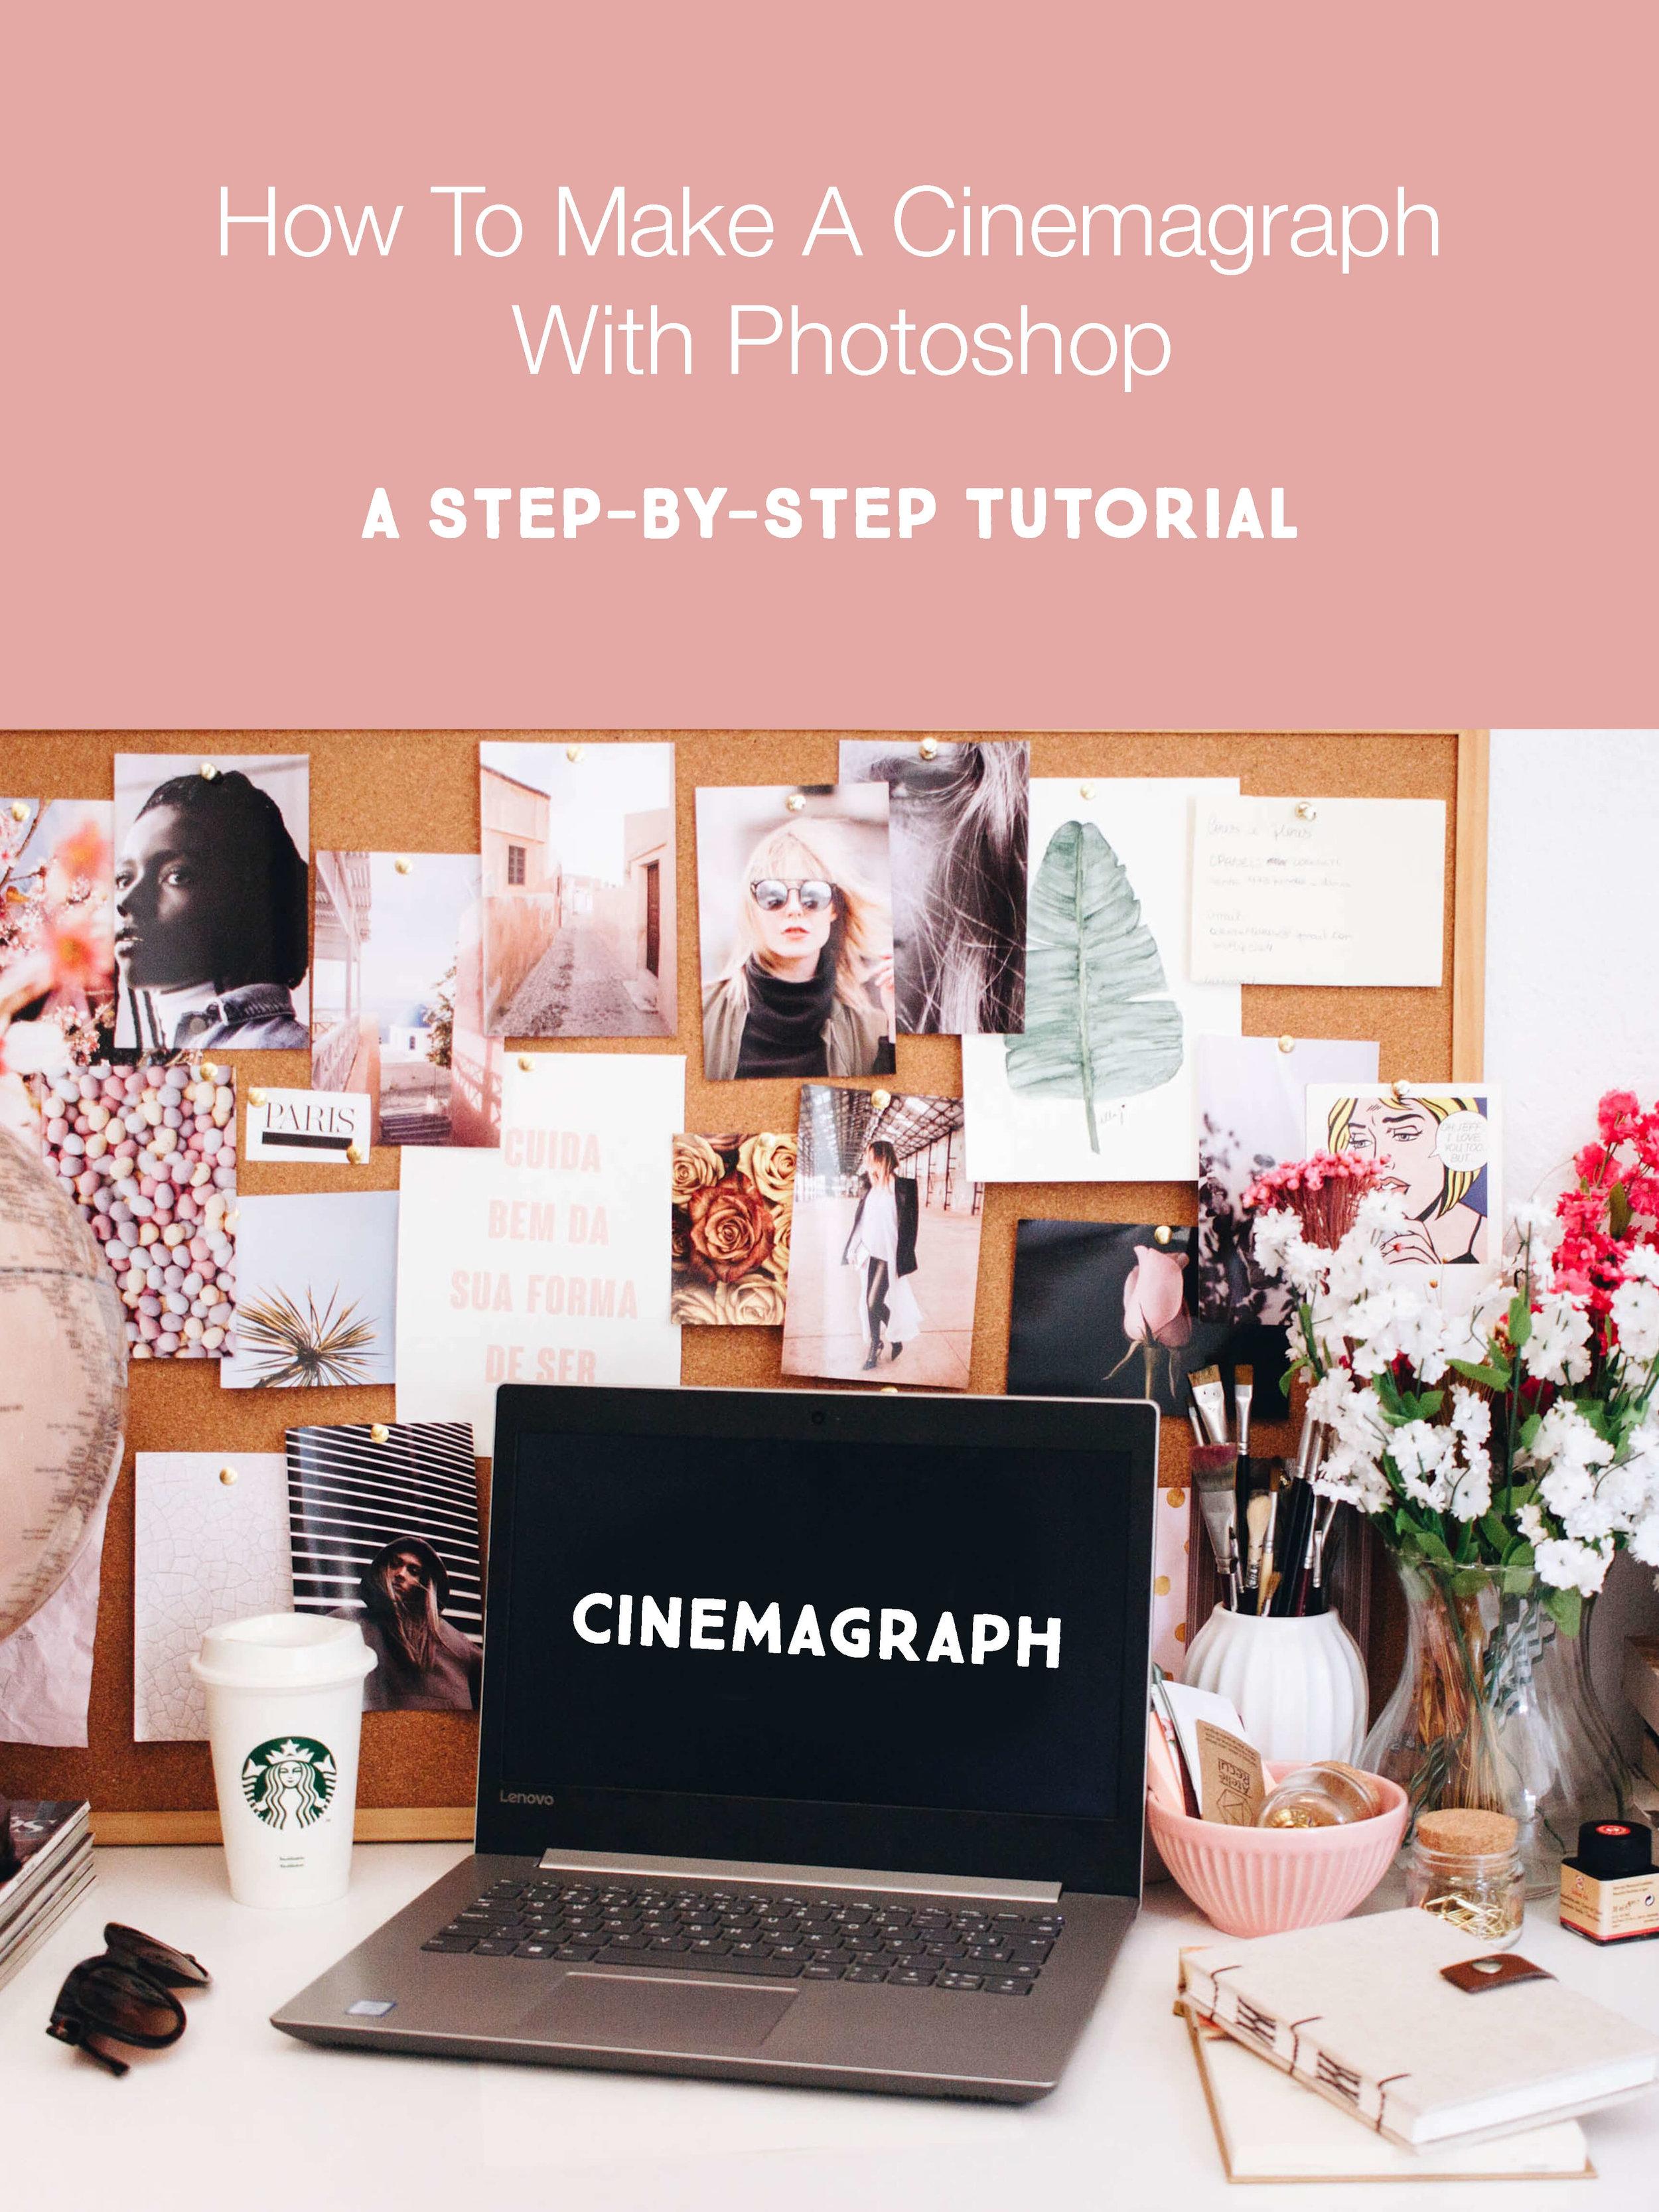 Cinemagraph-Pin-2.jpg